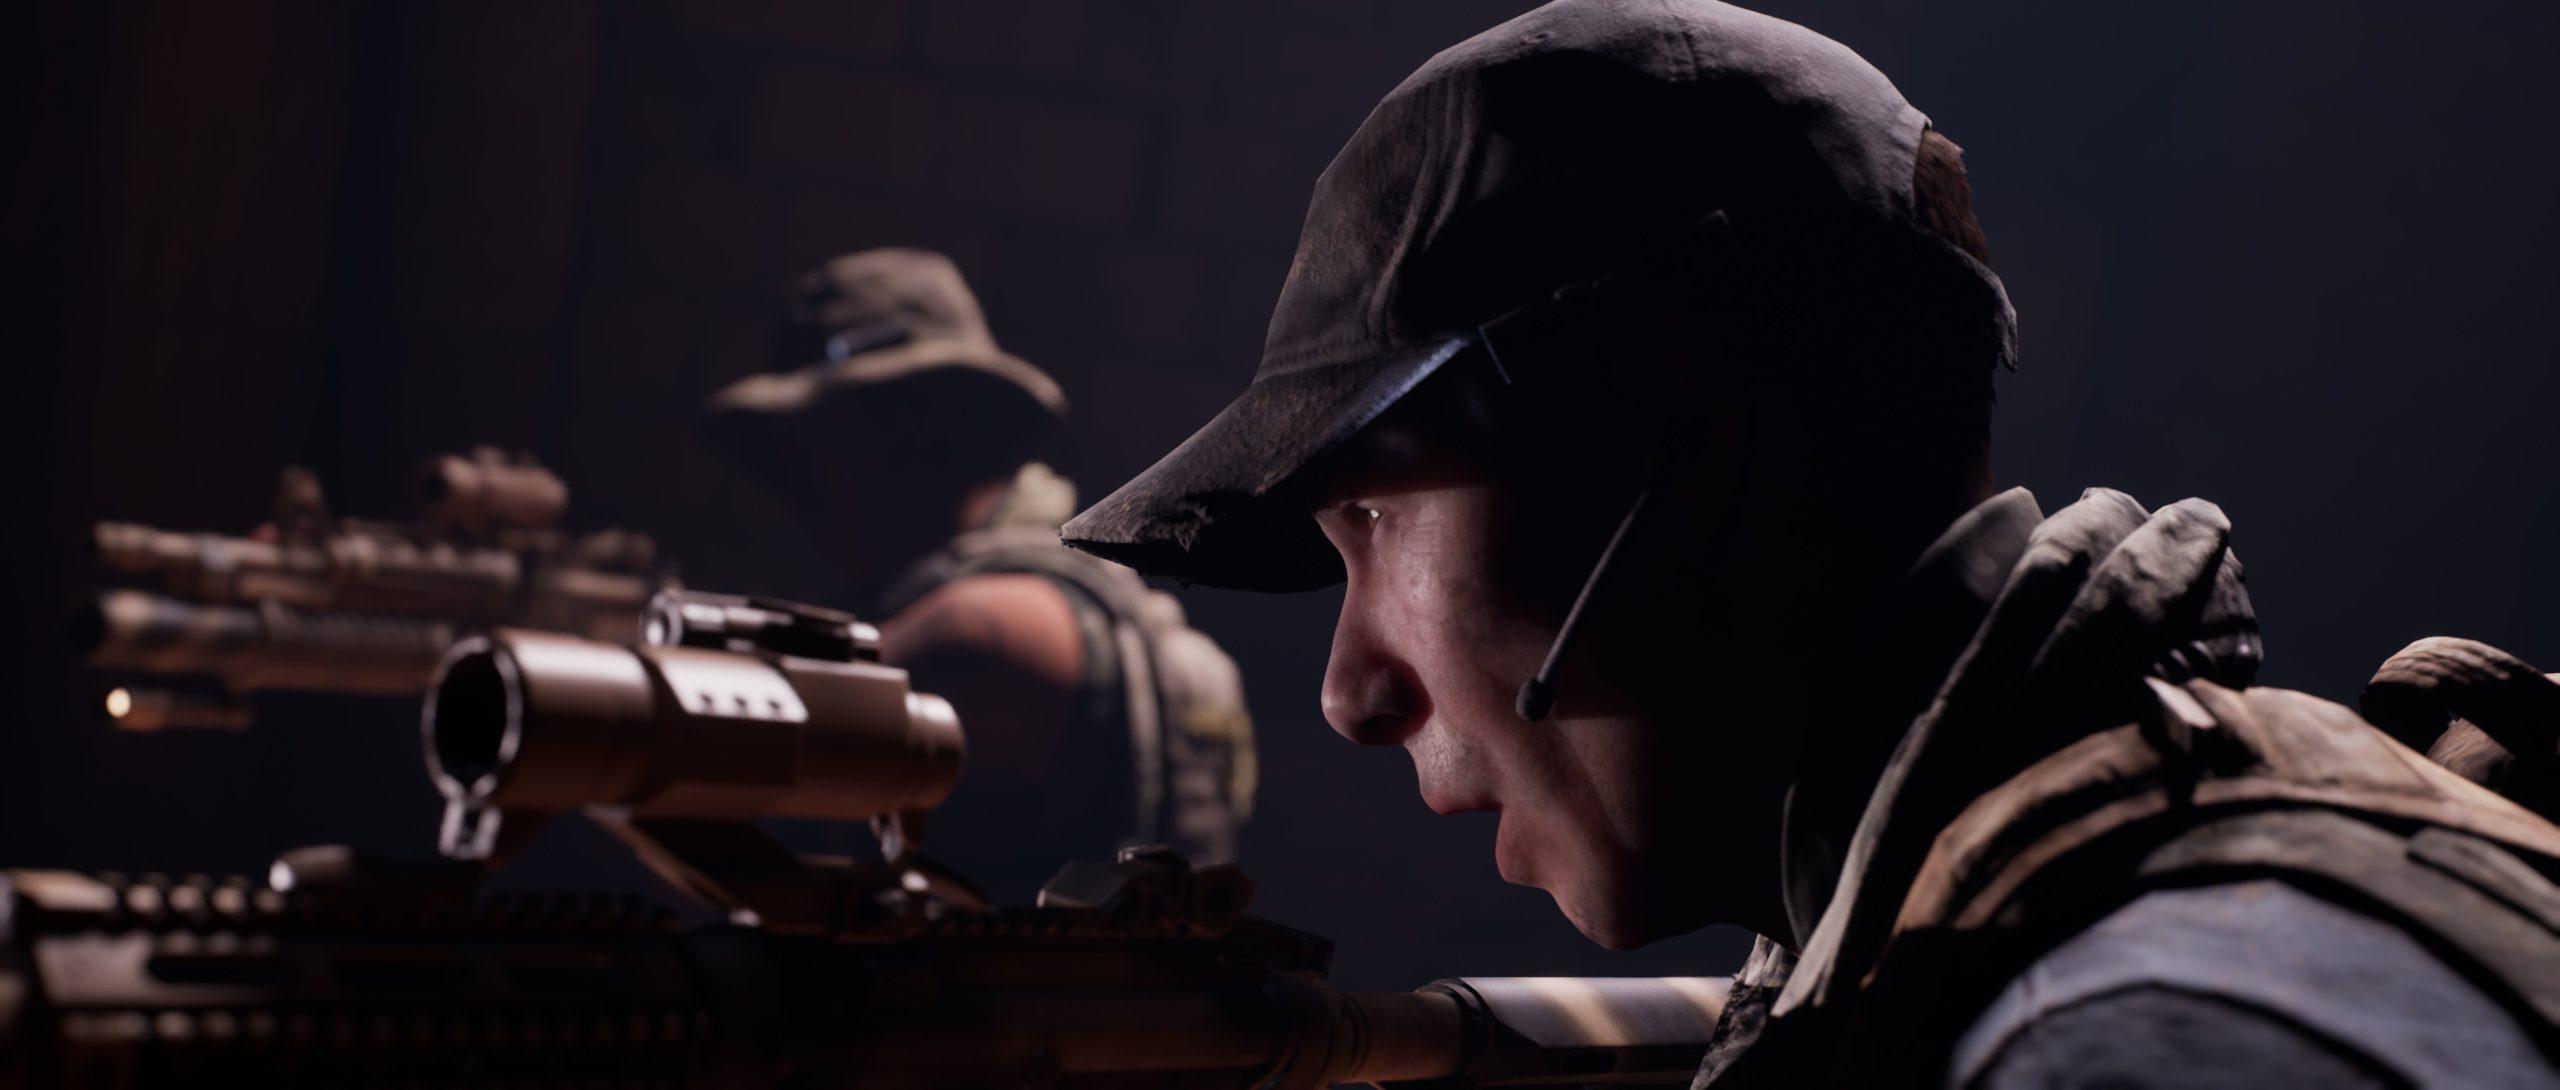 House of Ashes - E3 rozhovor 2 7